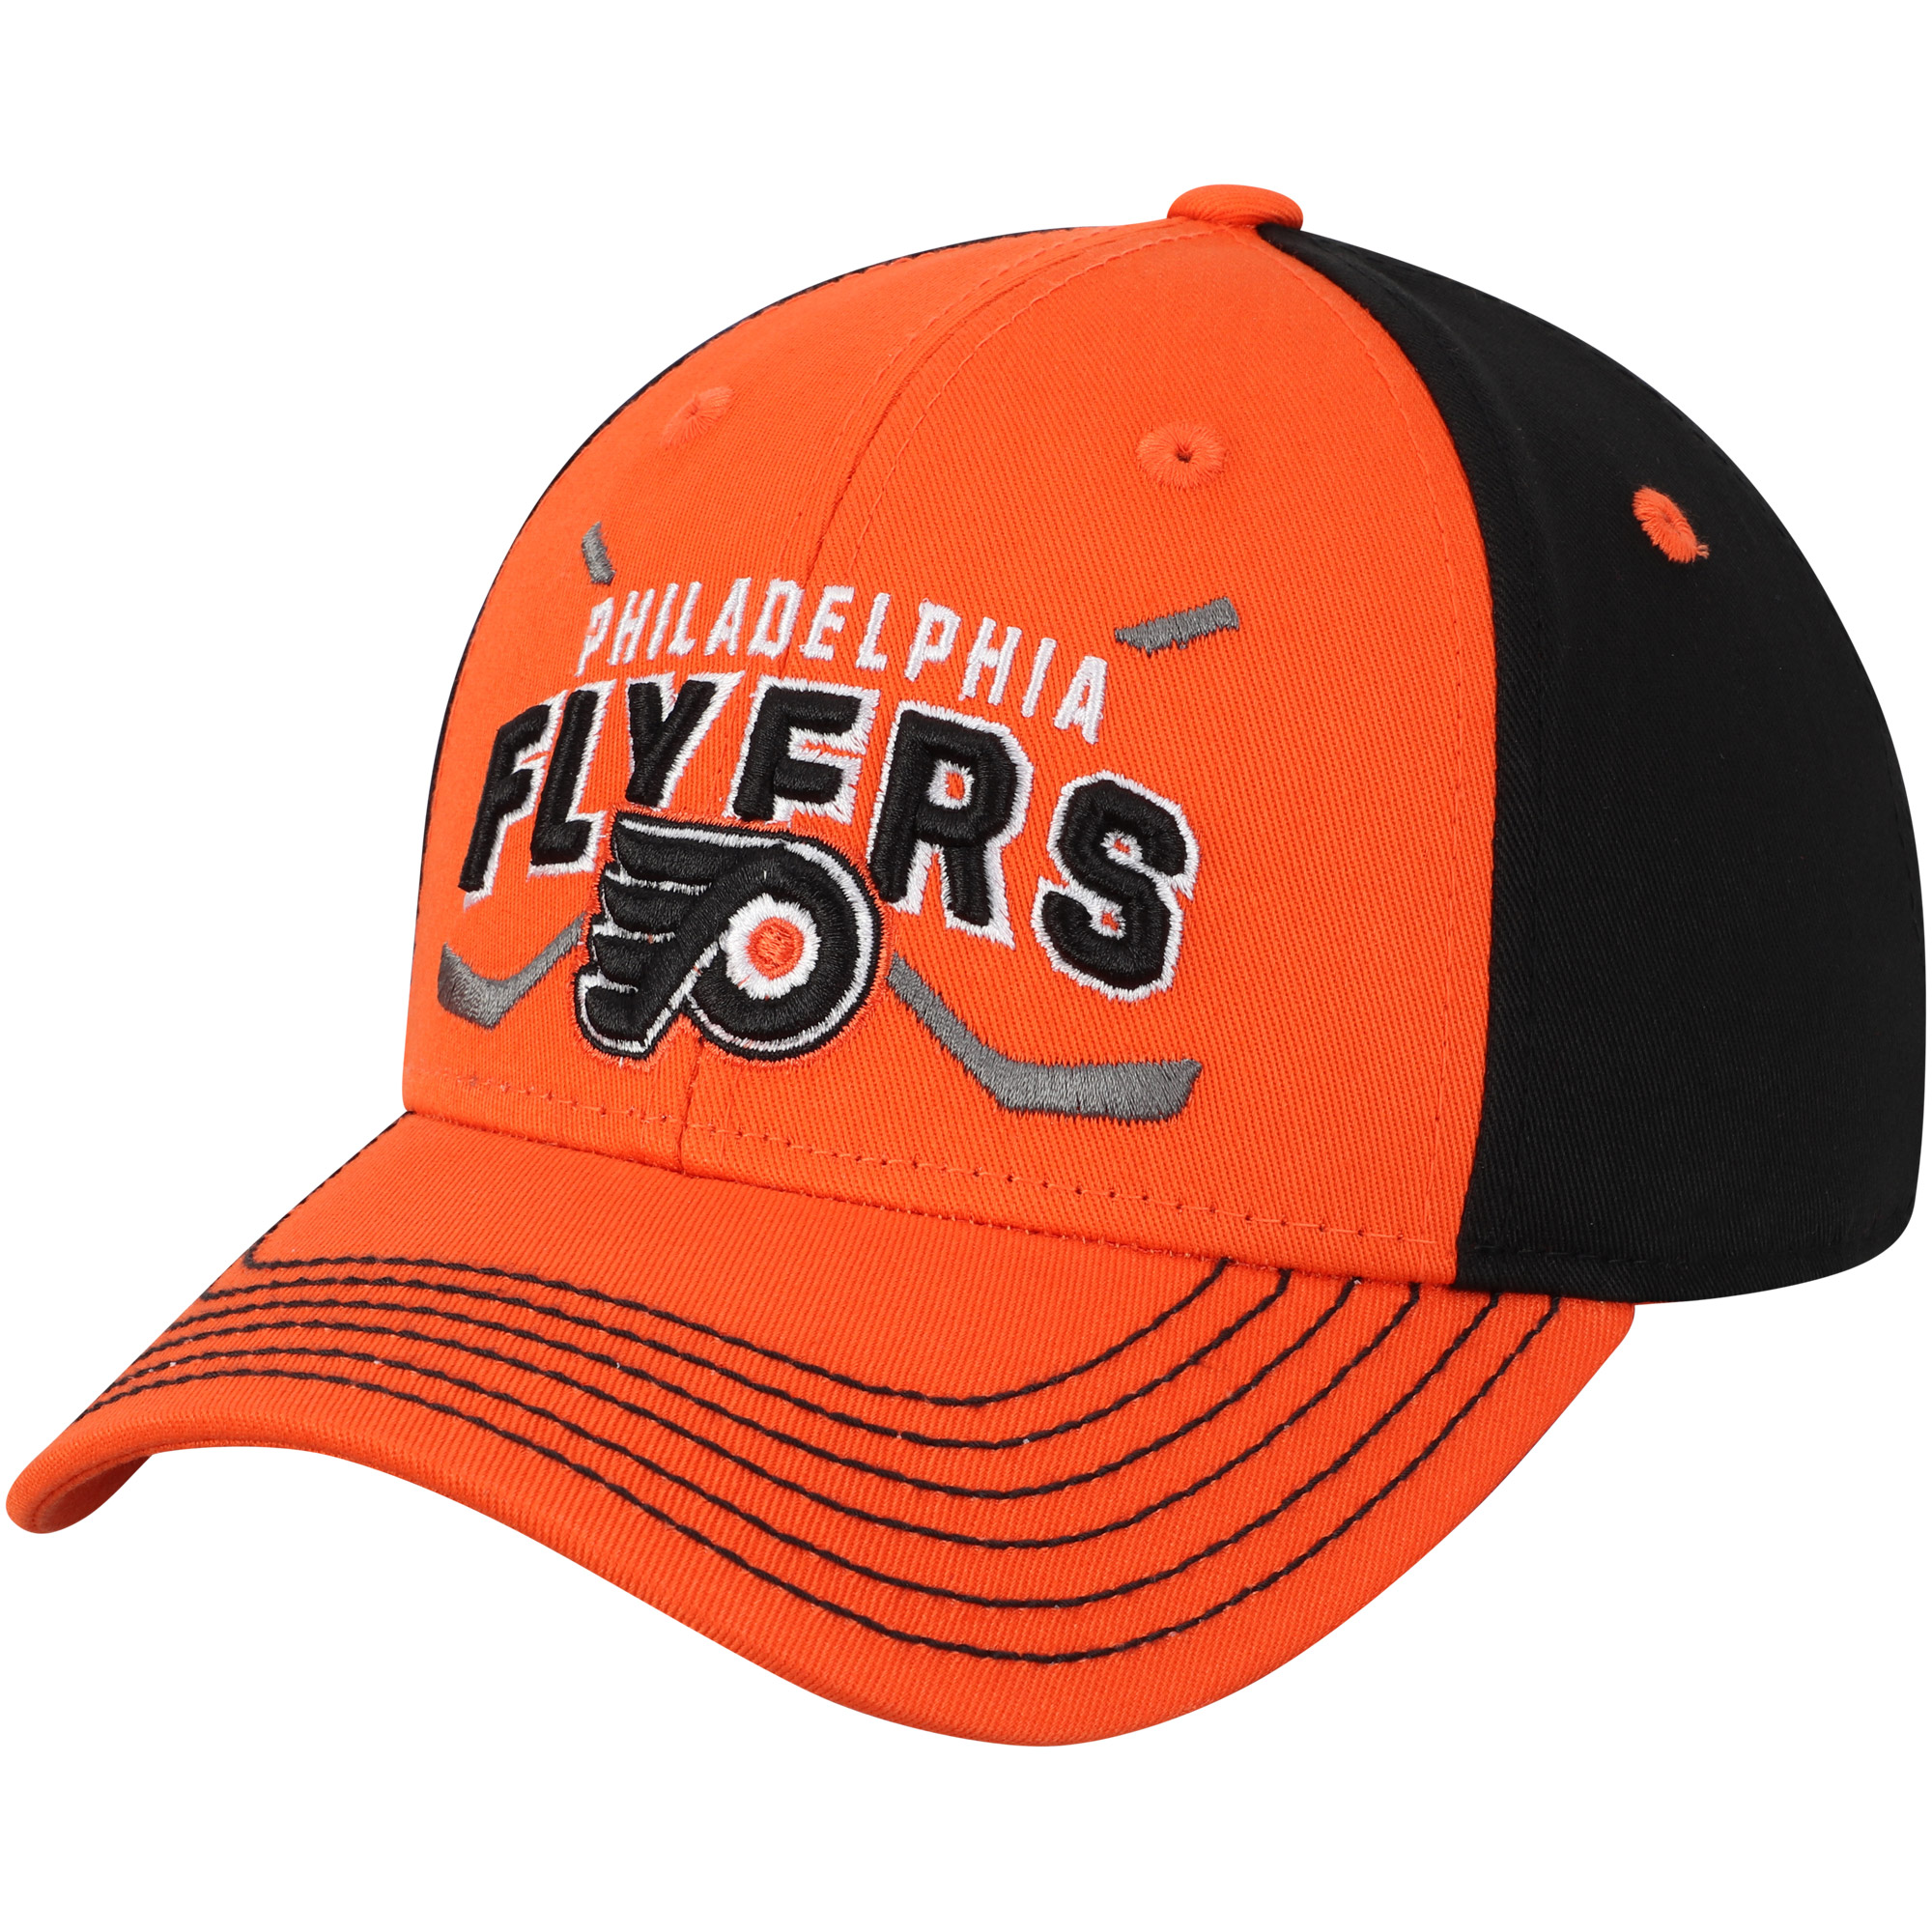 Philadelphia Flyers Youth Faceoff Adjustable Hat - Orange - OSFA